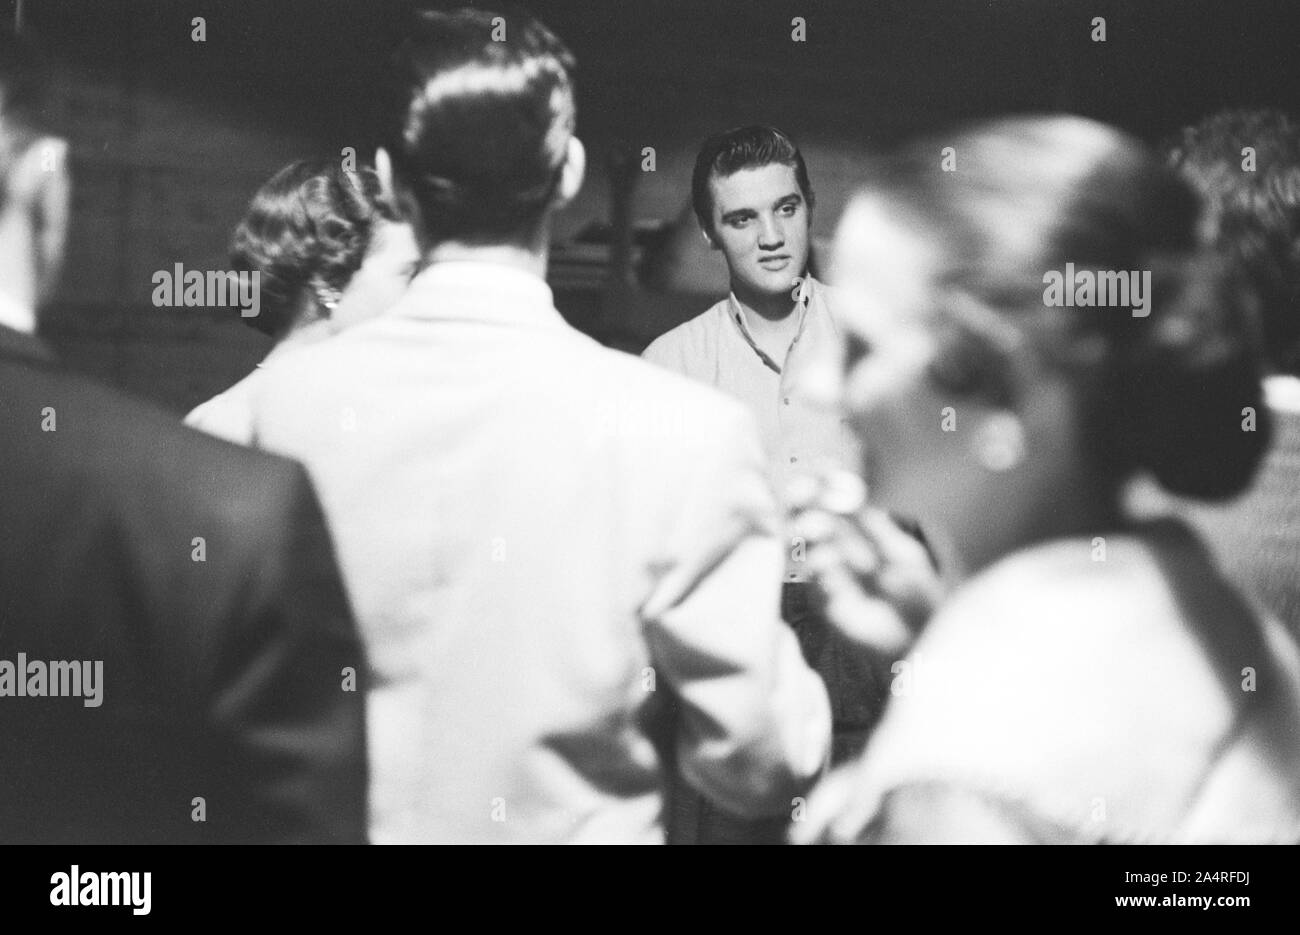 Elvis Presley backstage con ventole presso la University of Dayton Fieldhouse, 27 maggio, 1956. Foto Stock